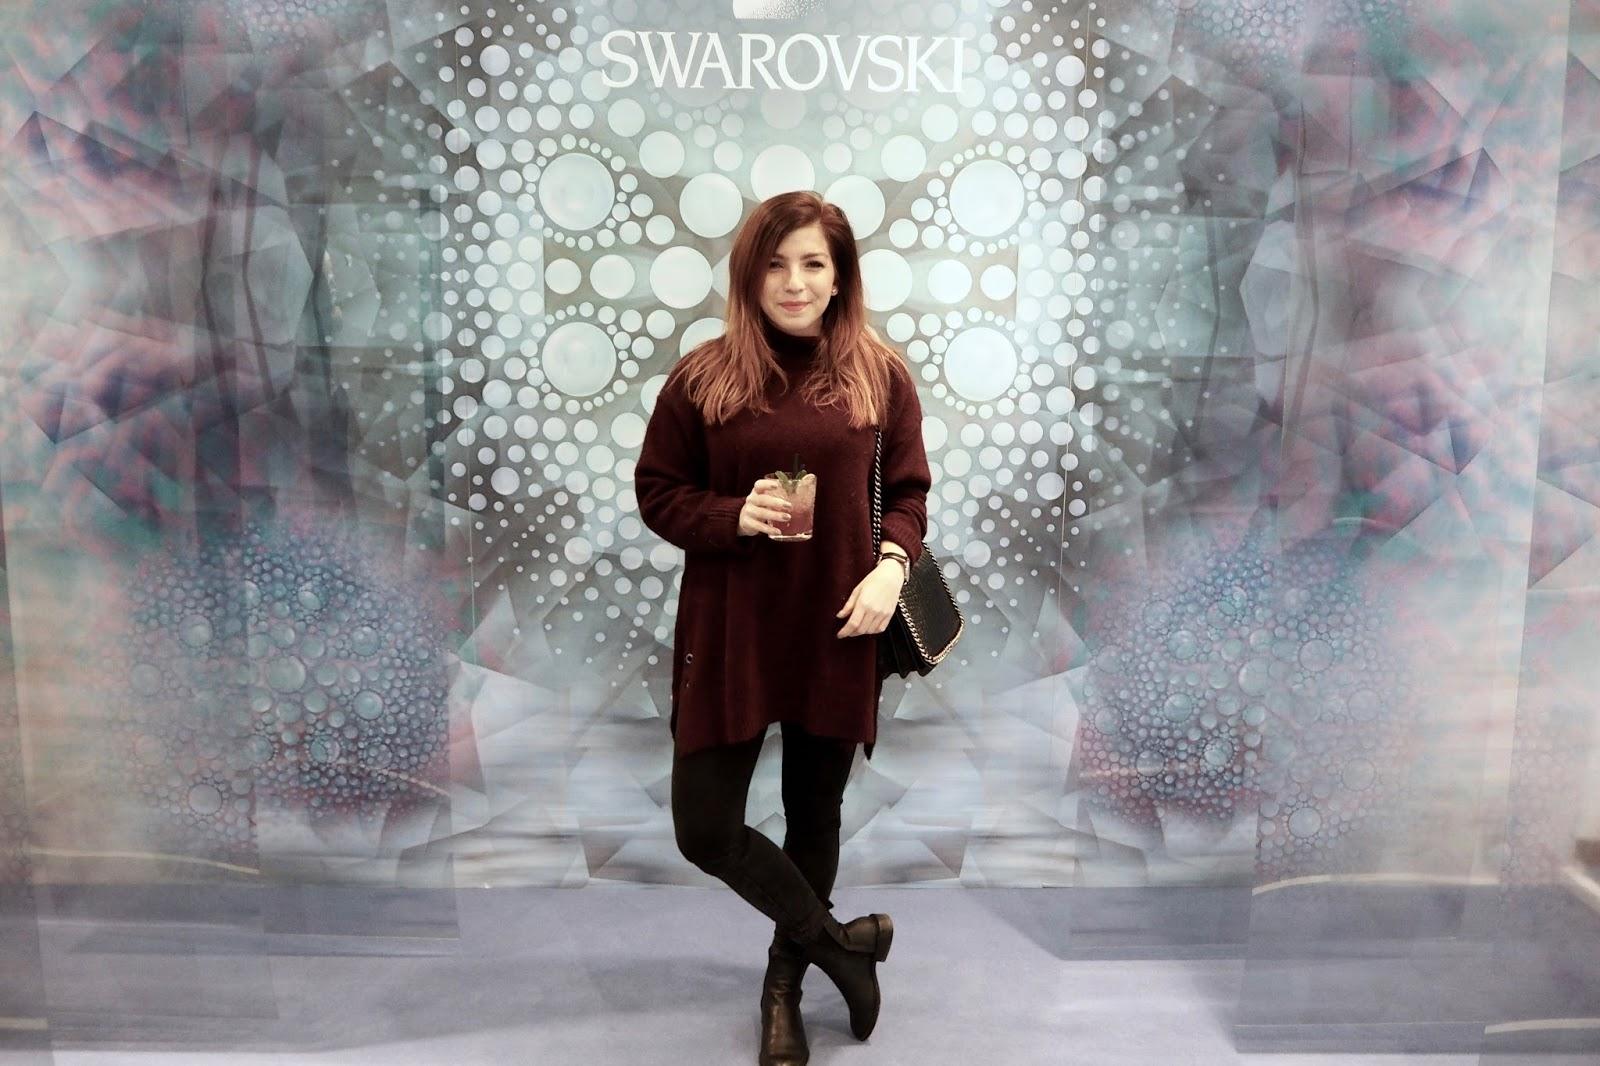 SWAROVSKI 8